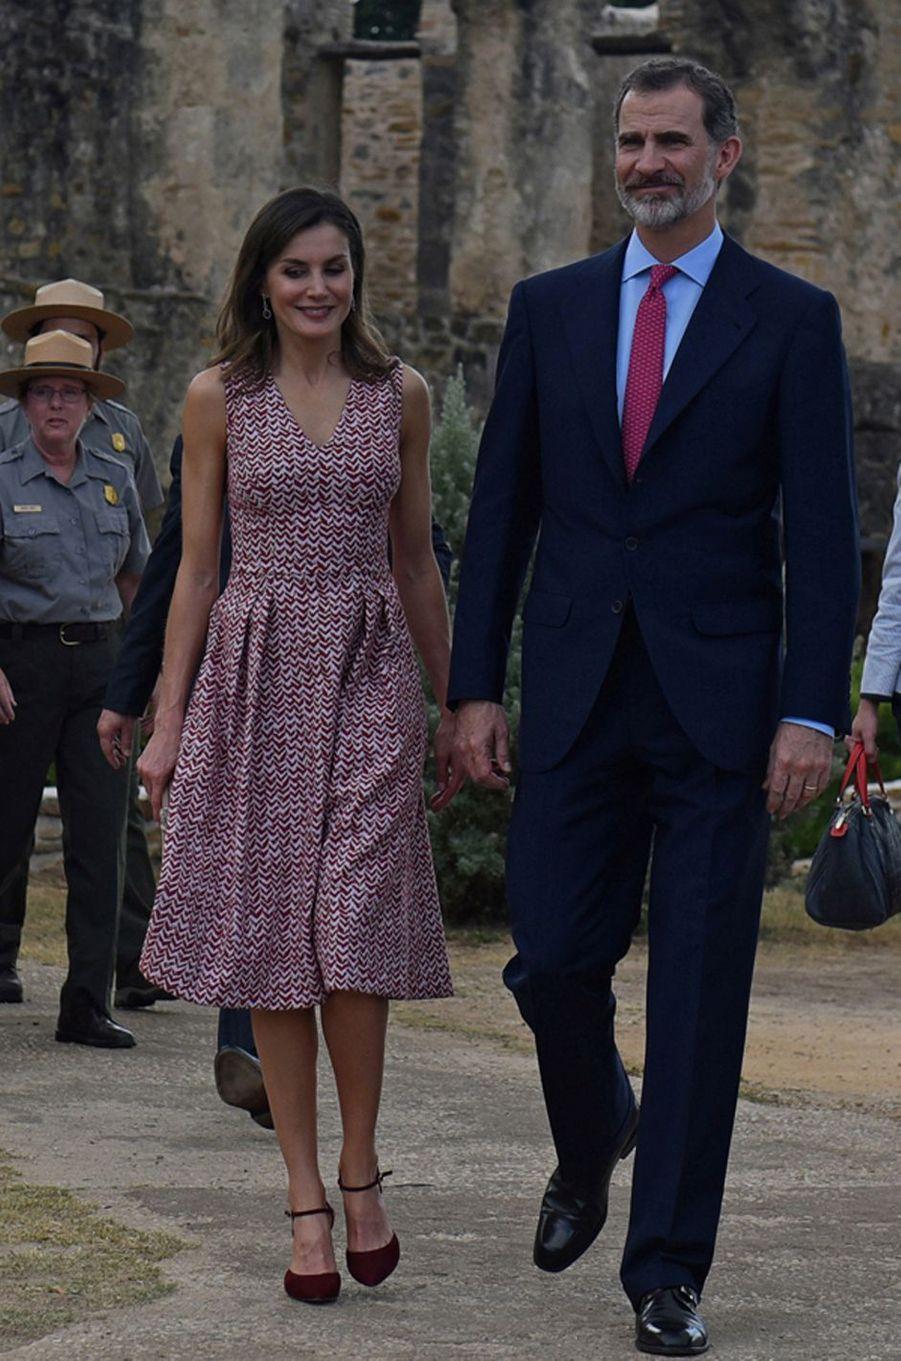 La reine Letizia d'Espagne dans une robe Carolina Herrera à San Antonio, le 17 juin 2018